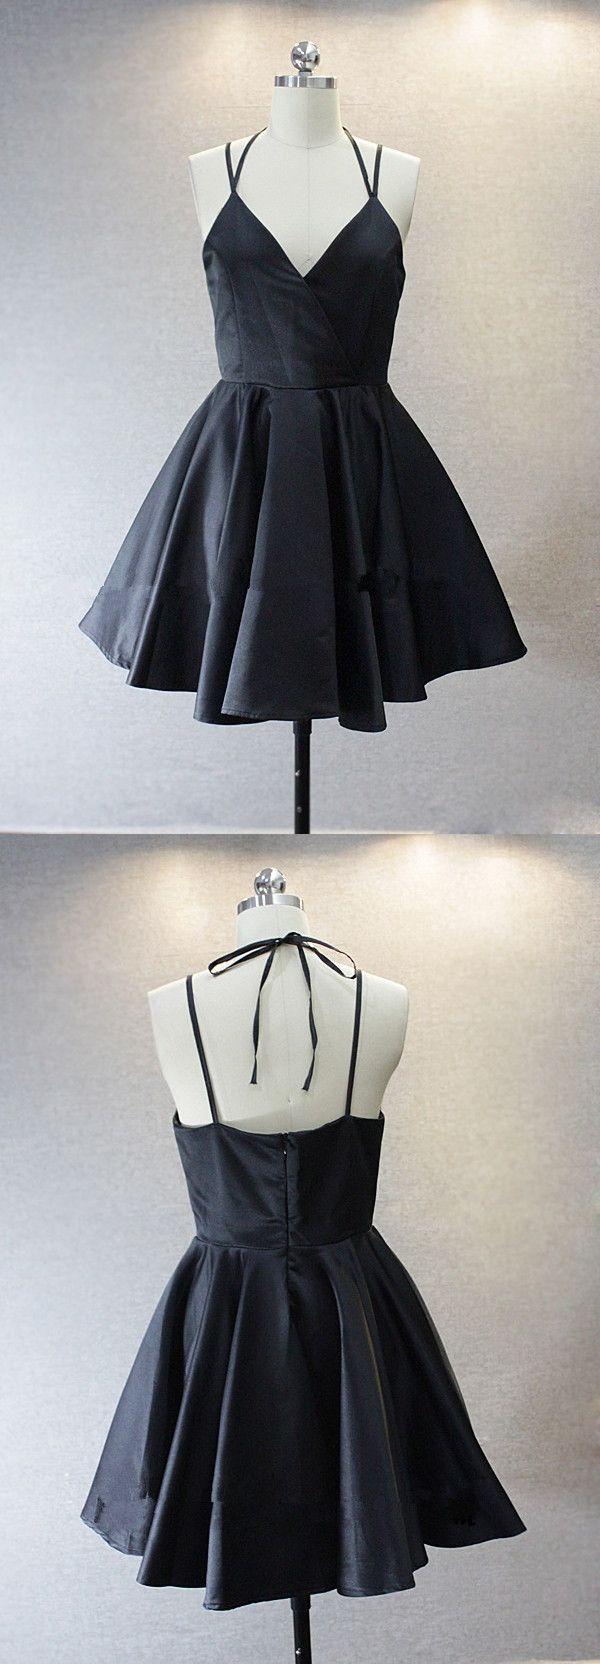 Simple V-neck Sleeveless Short Black Taffeta Homecoming Dress with Spaghetti…